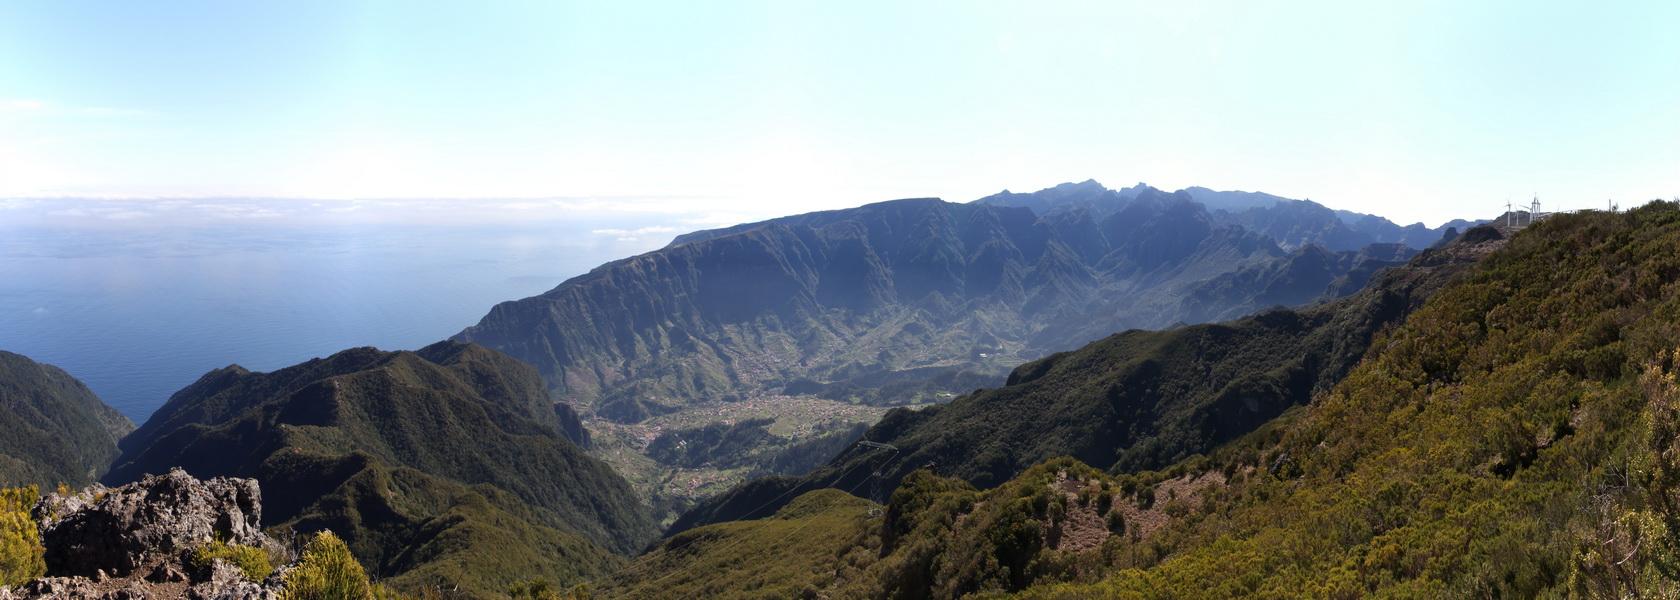 Blick vom Pico Ruivo do Paul 1640 nach Osten